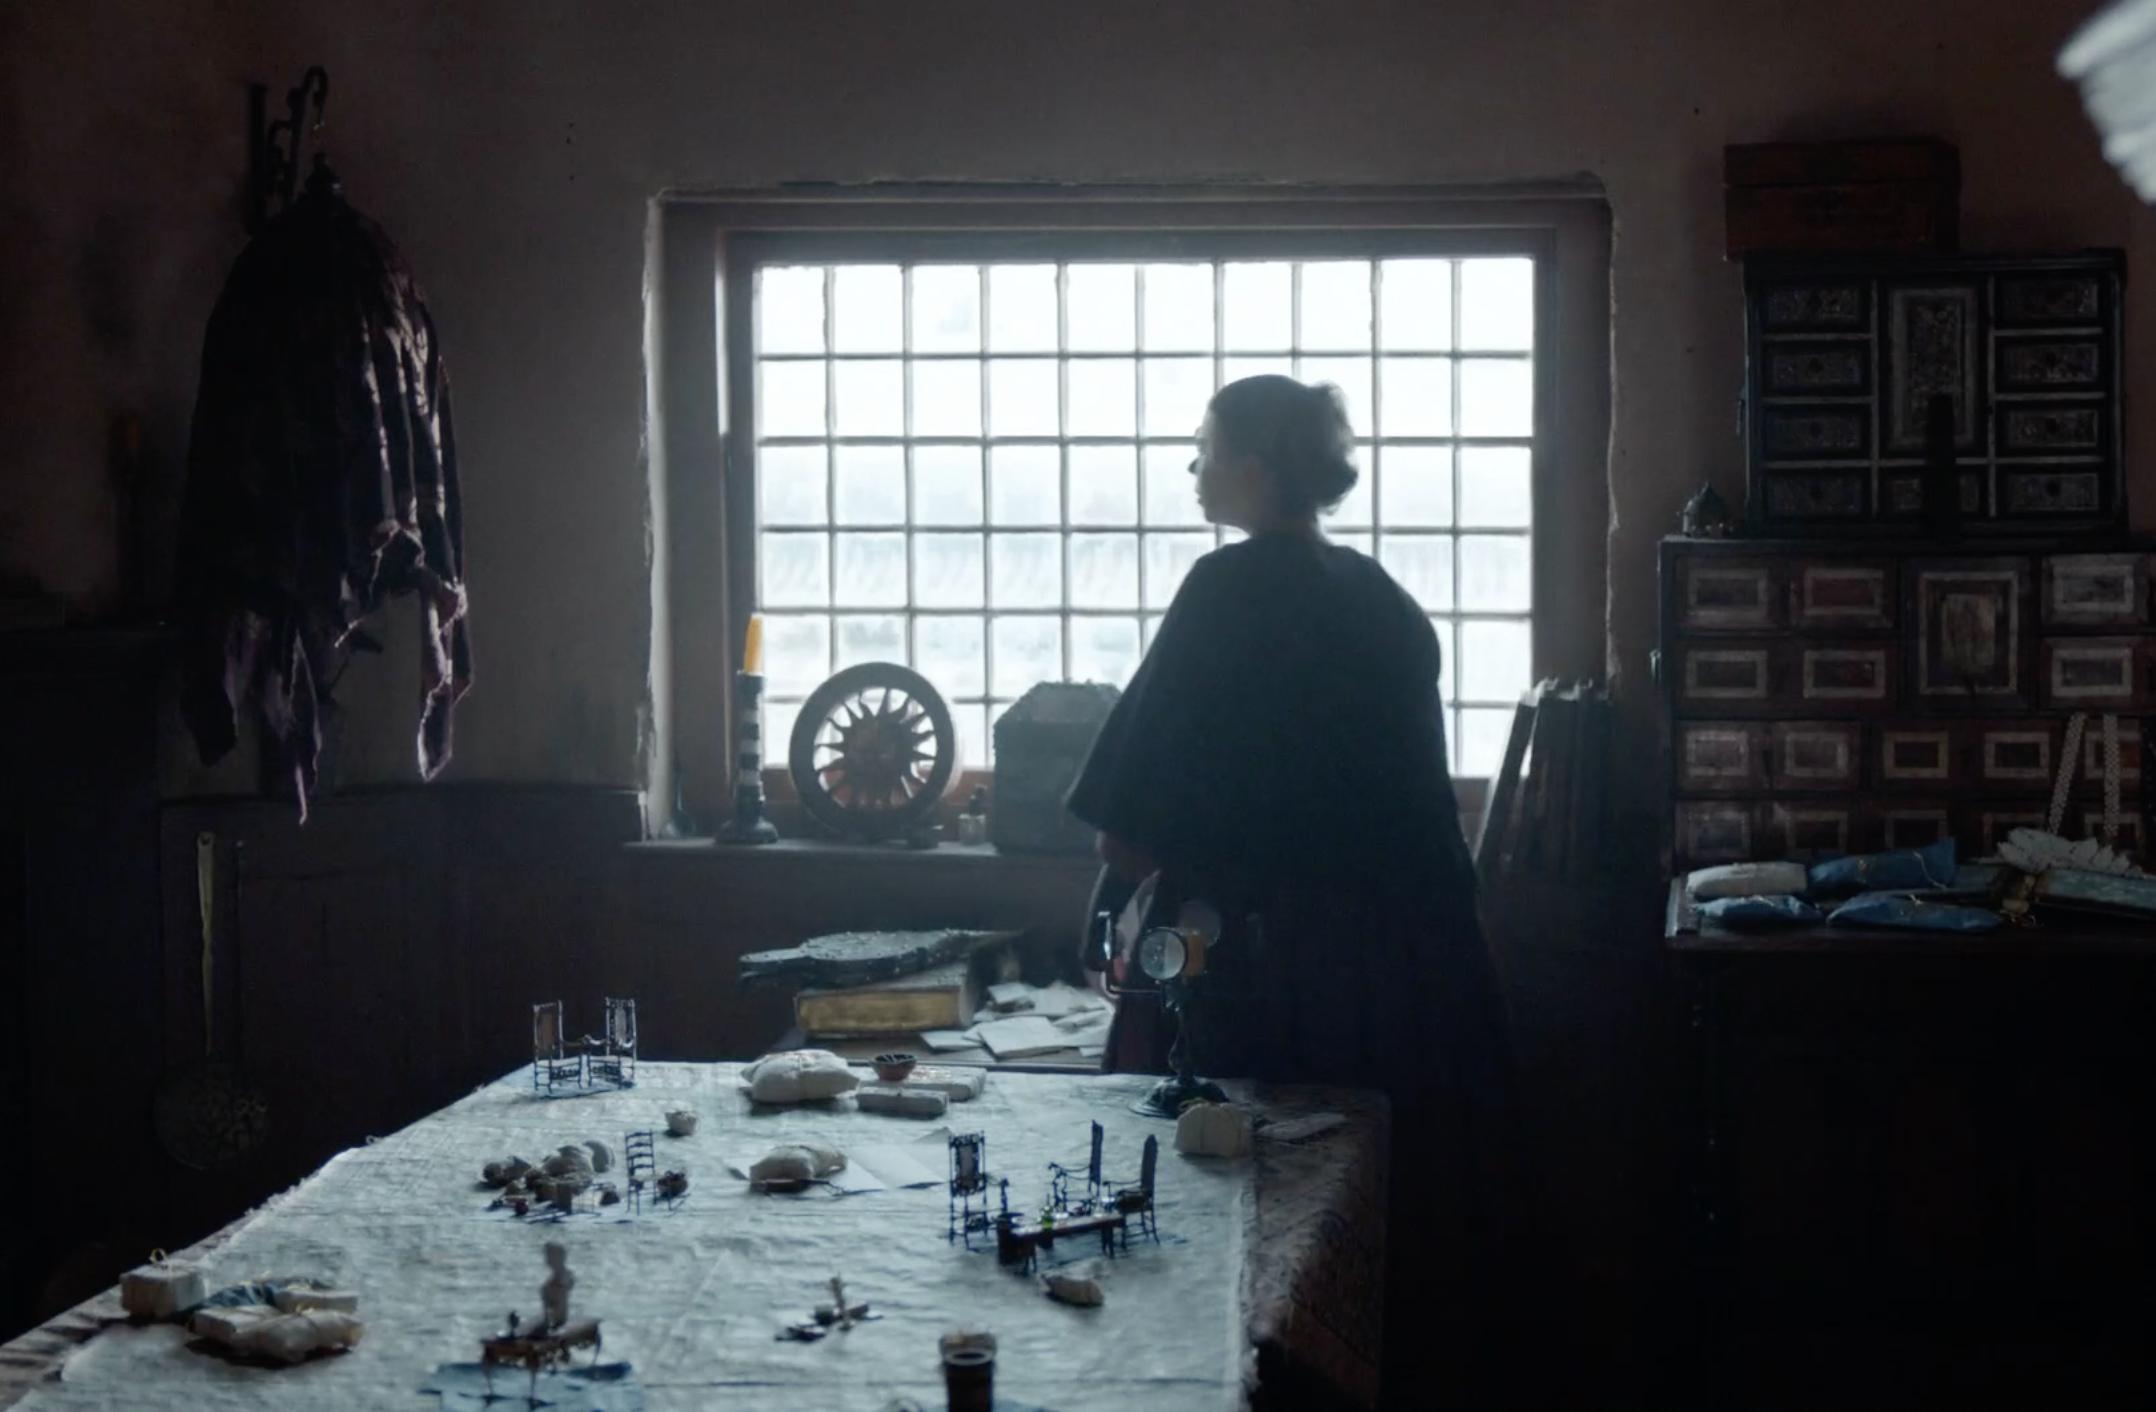 the-miniaturist-bbc-drama-david-roger-production-design-15.png